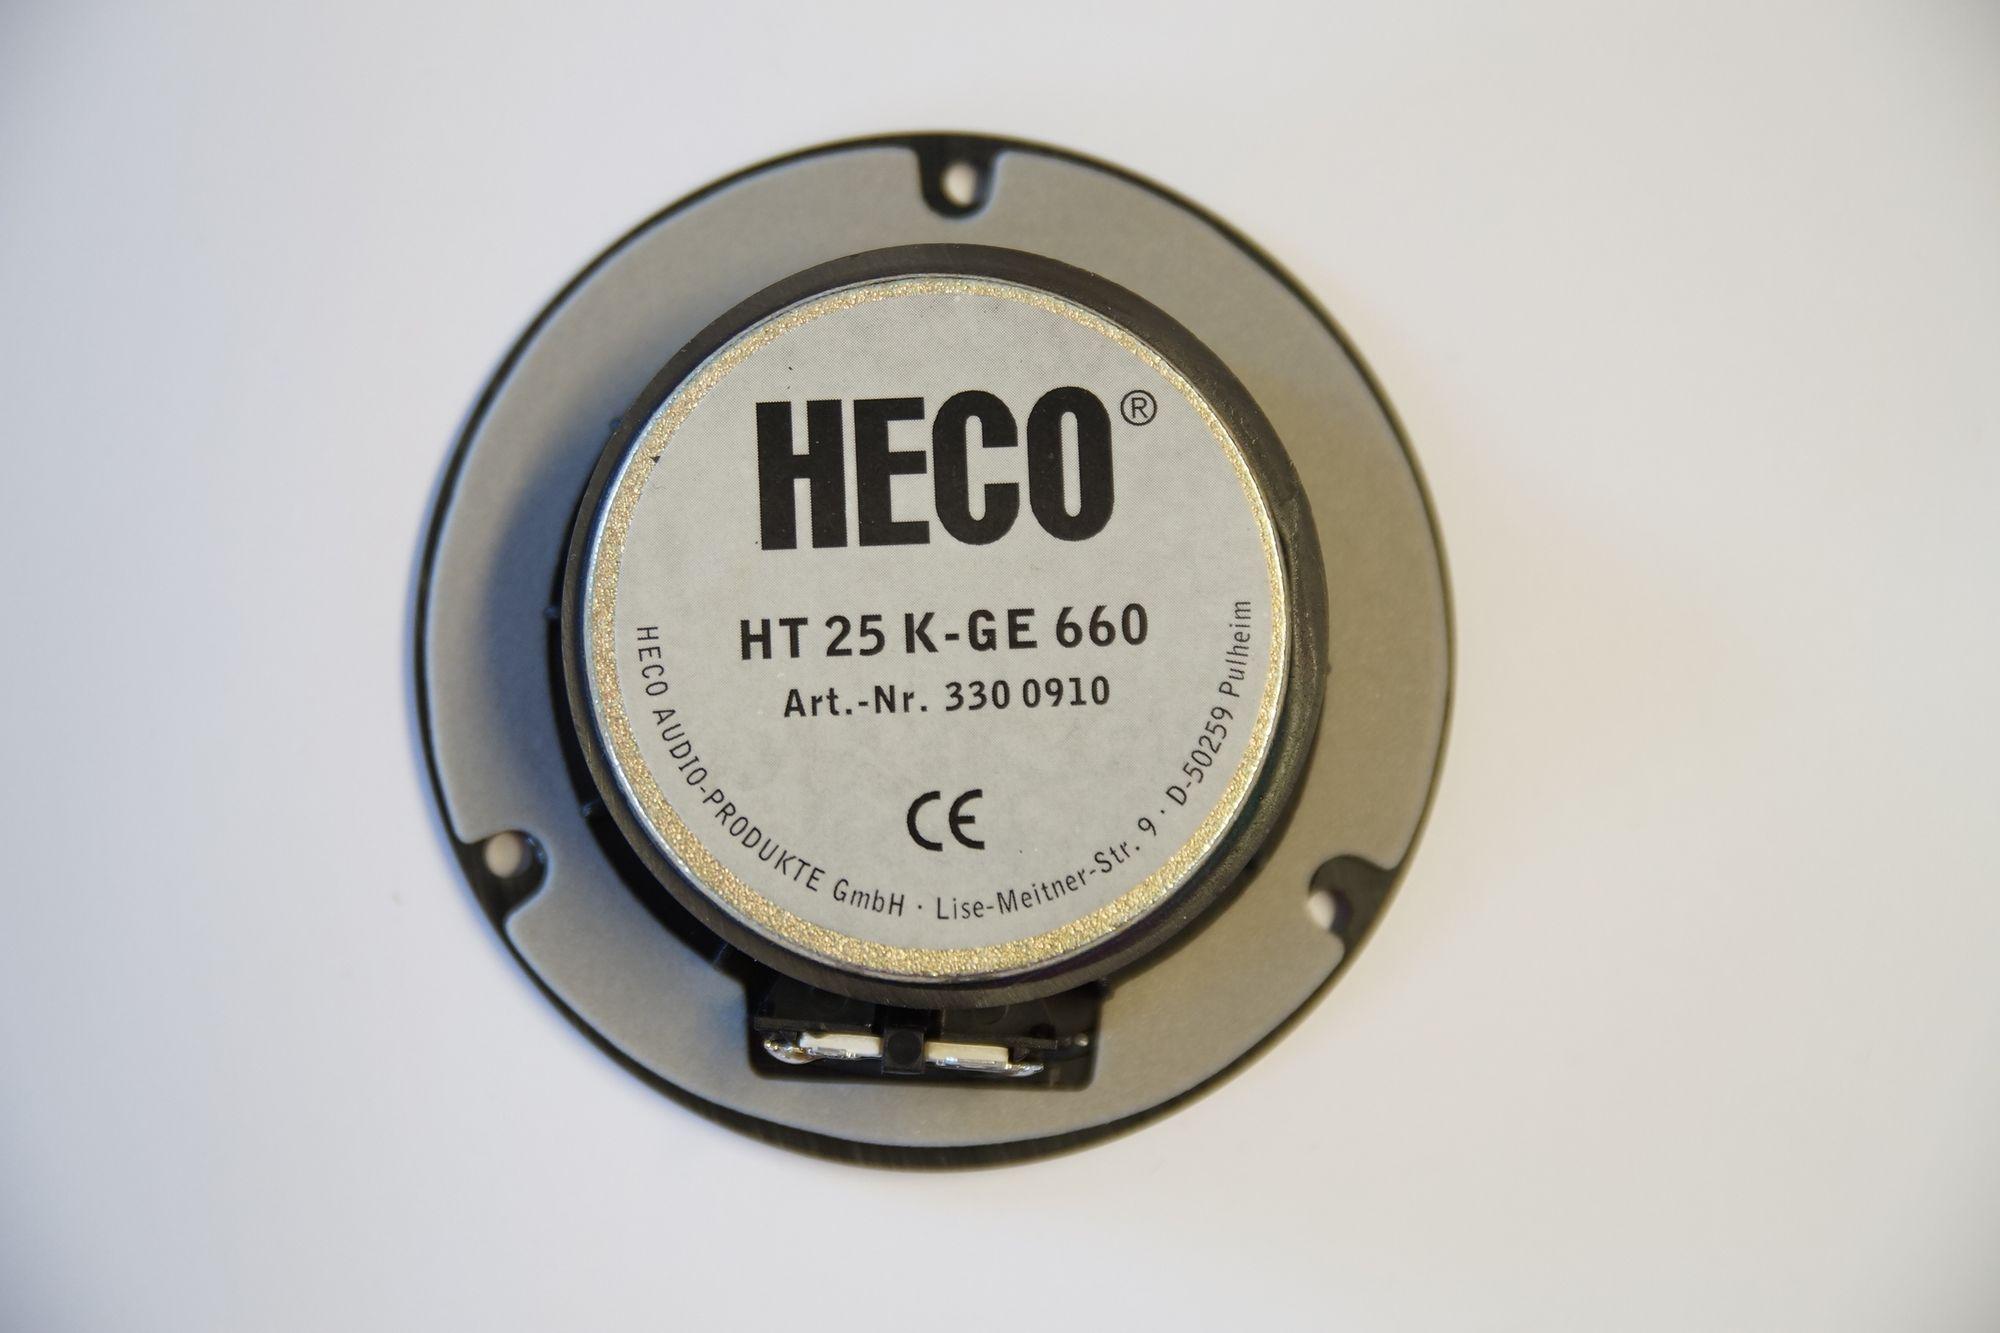 1 Paar Heco Onyx 10 Hochtöner HT 25 K-GE 660 Neu – Bild 2